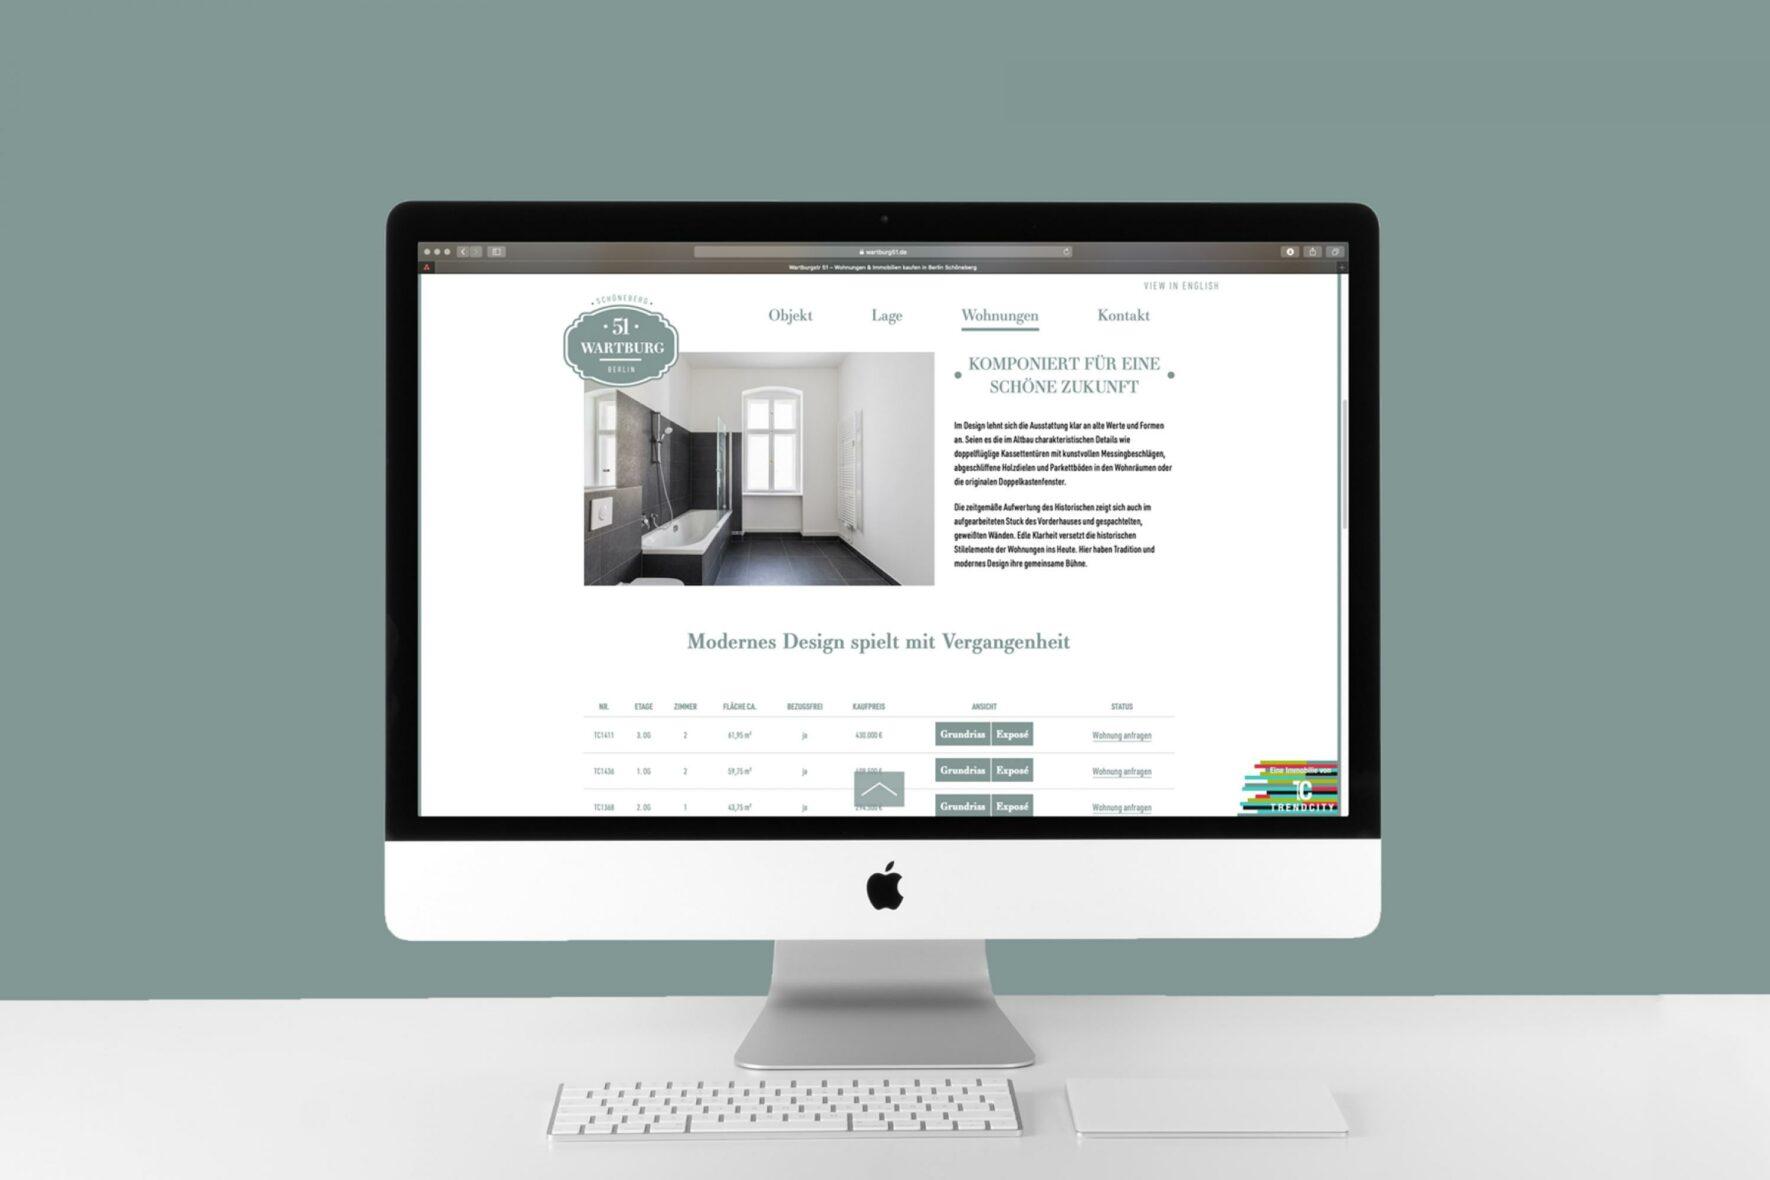 Website-Webdesign-Immobilienbranding-Wartburg-Trendcity-Broschüre-FORMLOS-berlin-6